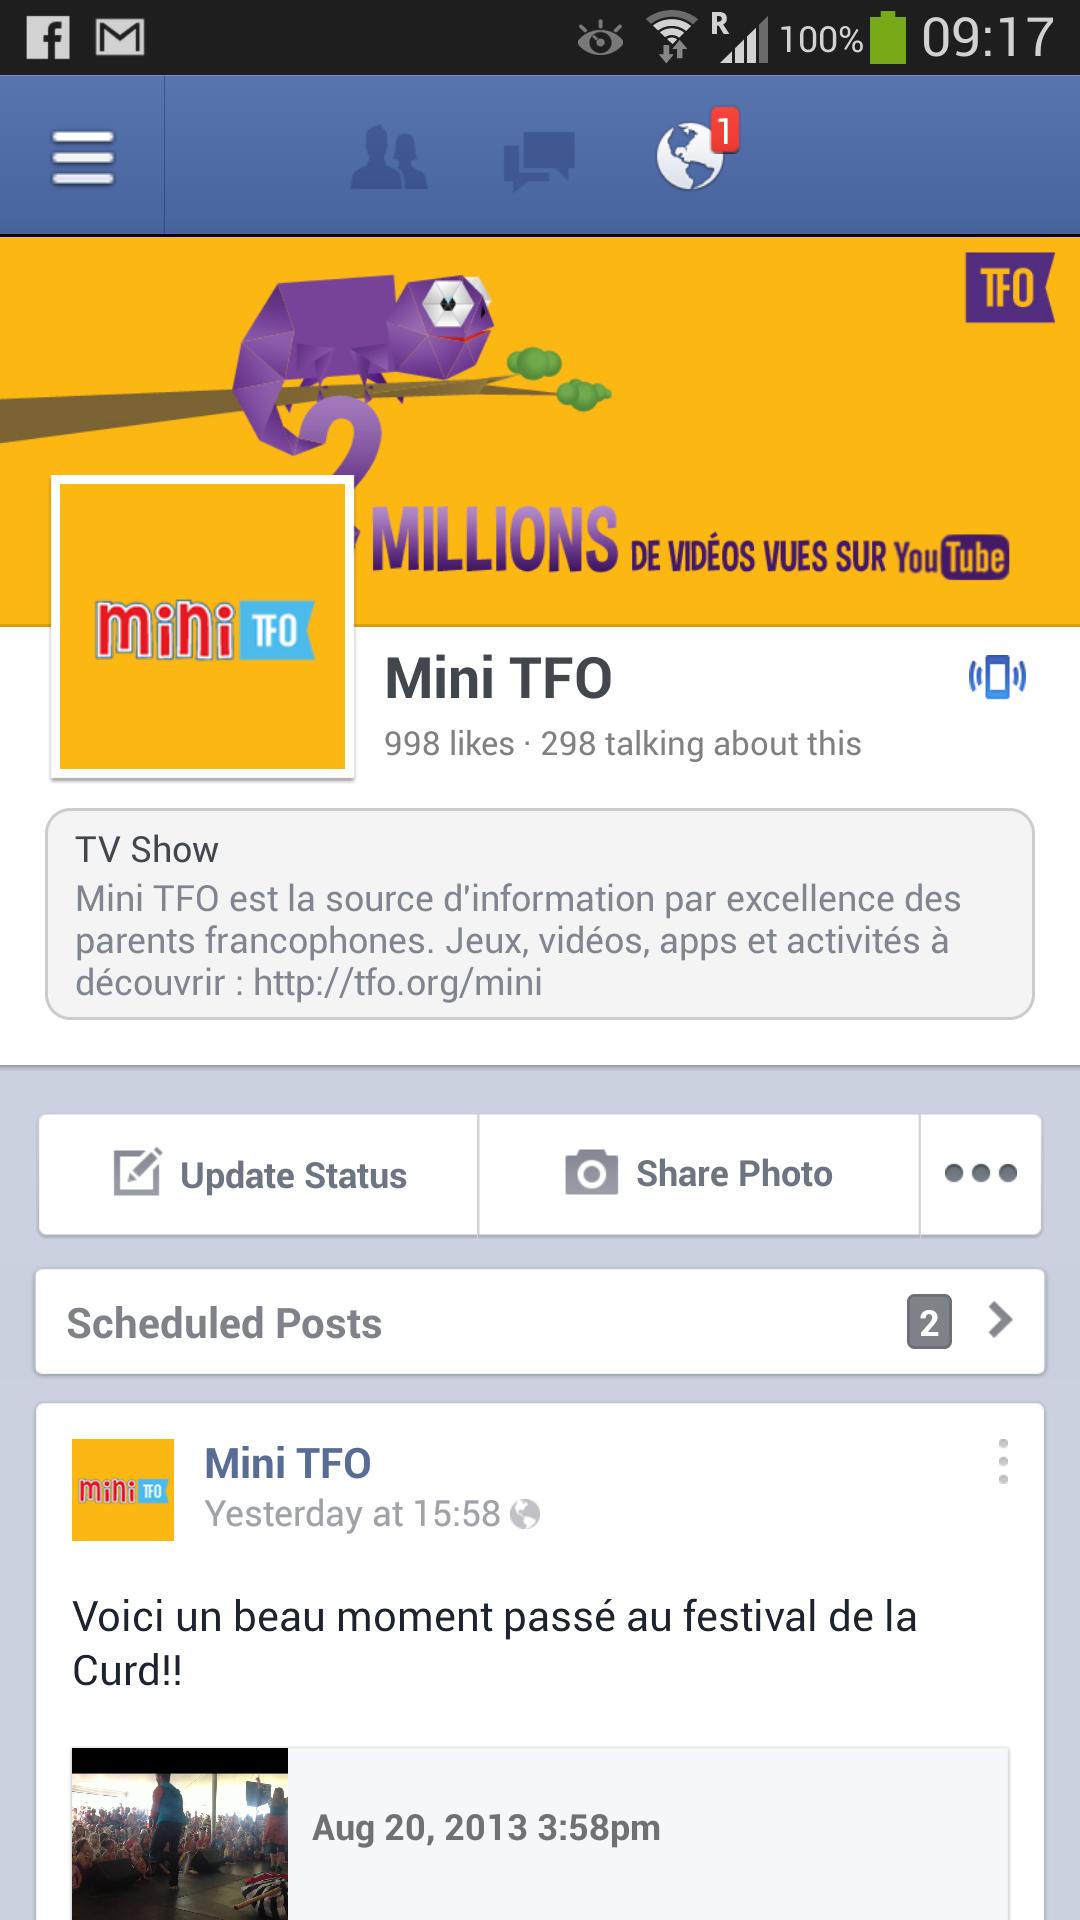 Facebook Profile of Mini TFO 2013